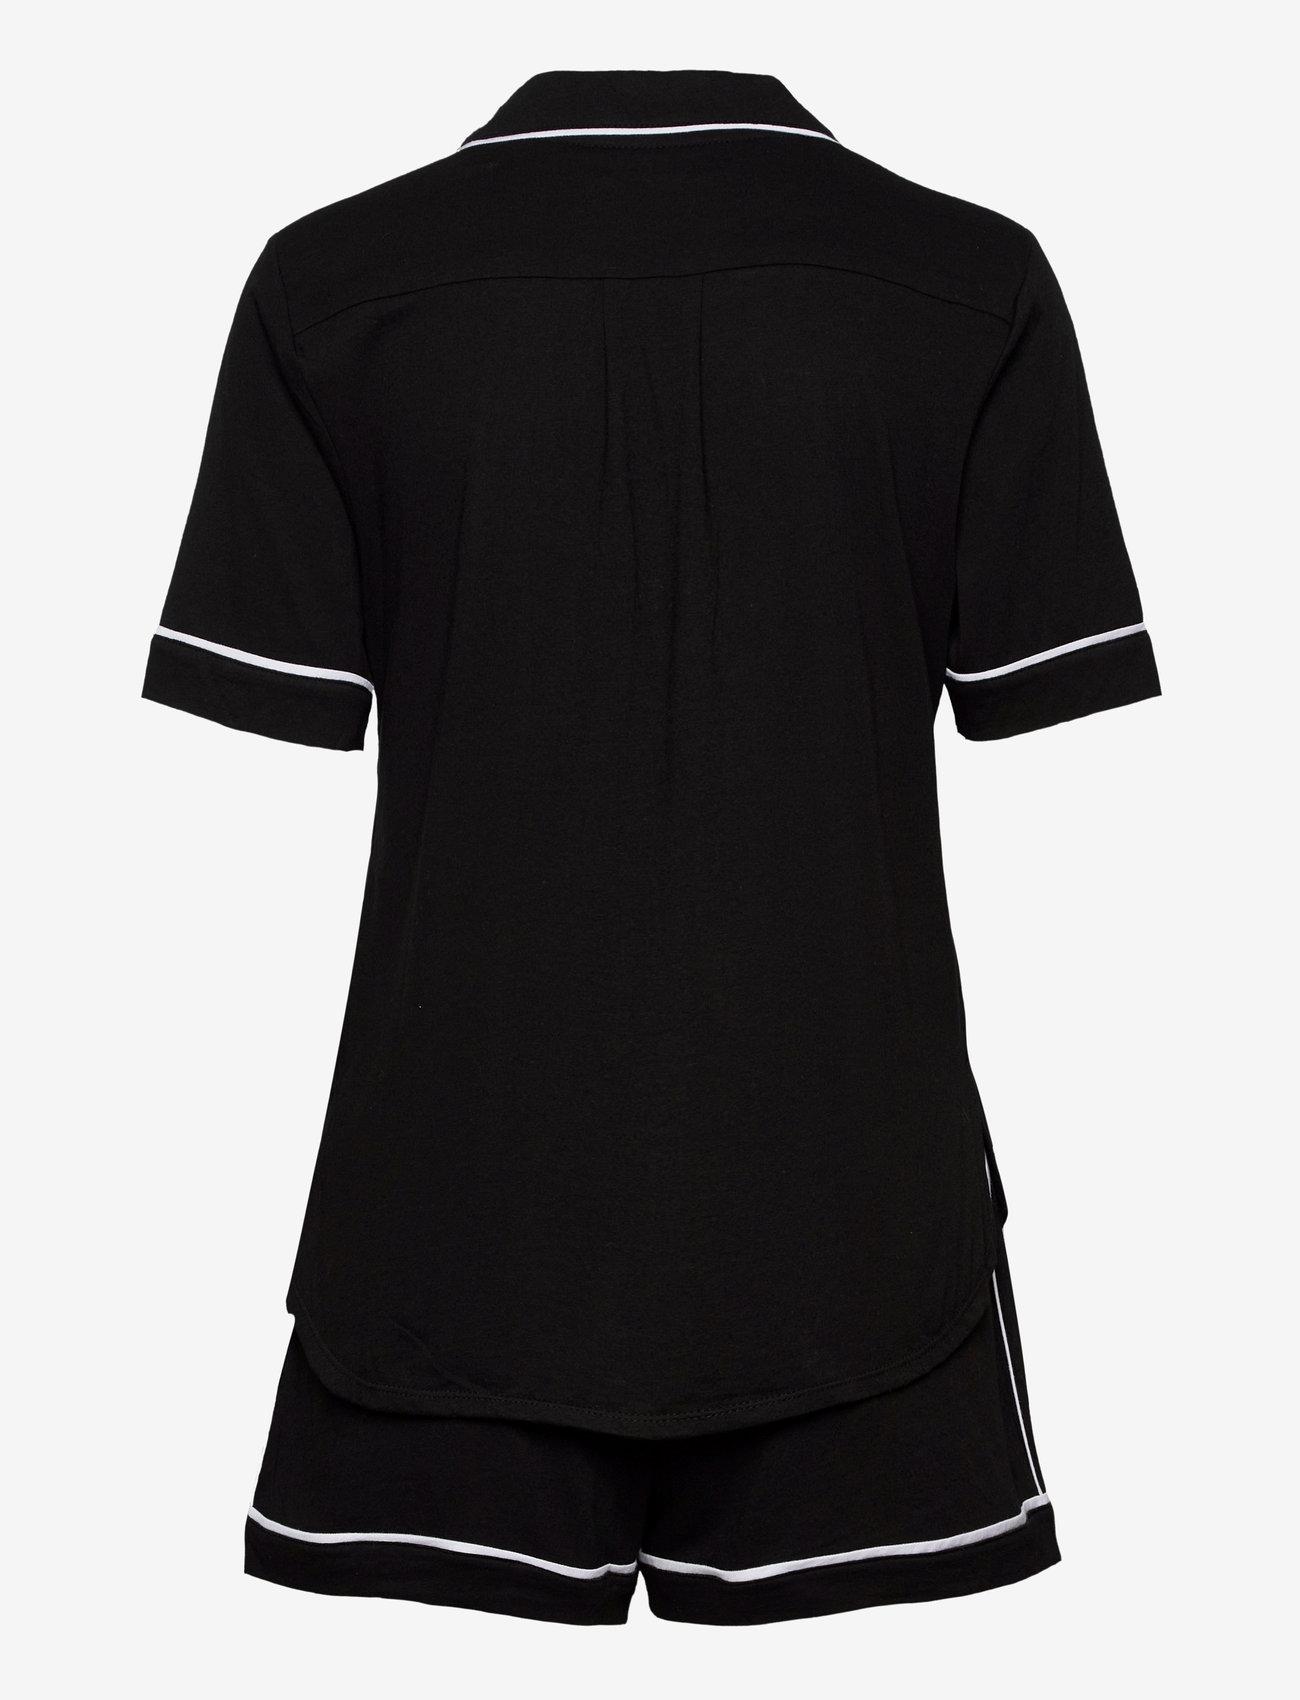 DKNY Homewear - DKNY NEW SIGNATURE S/S TOP & BOXER PJ - pyjama''s - black - 1